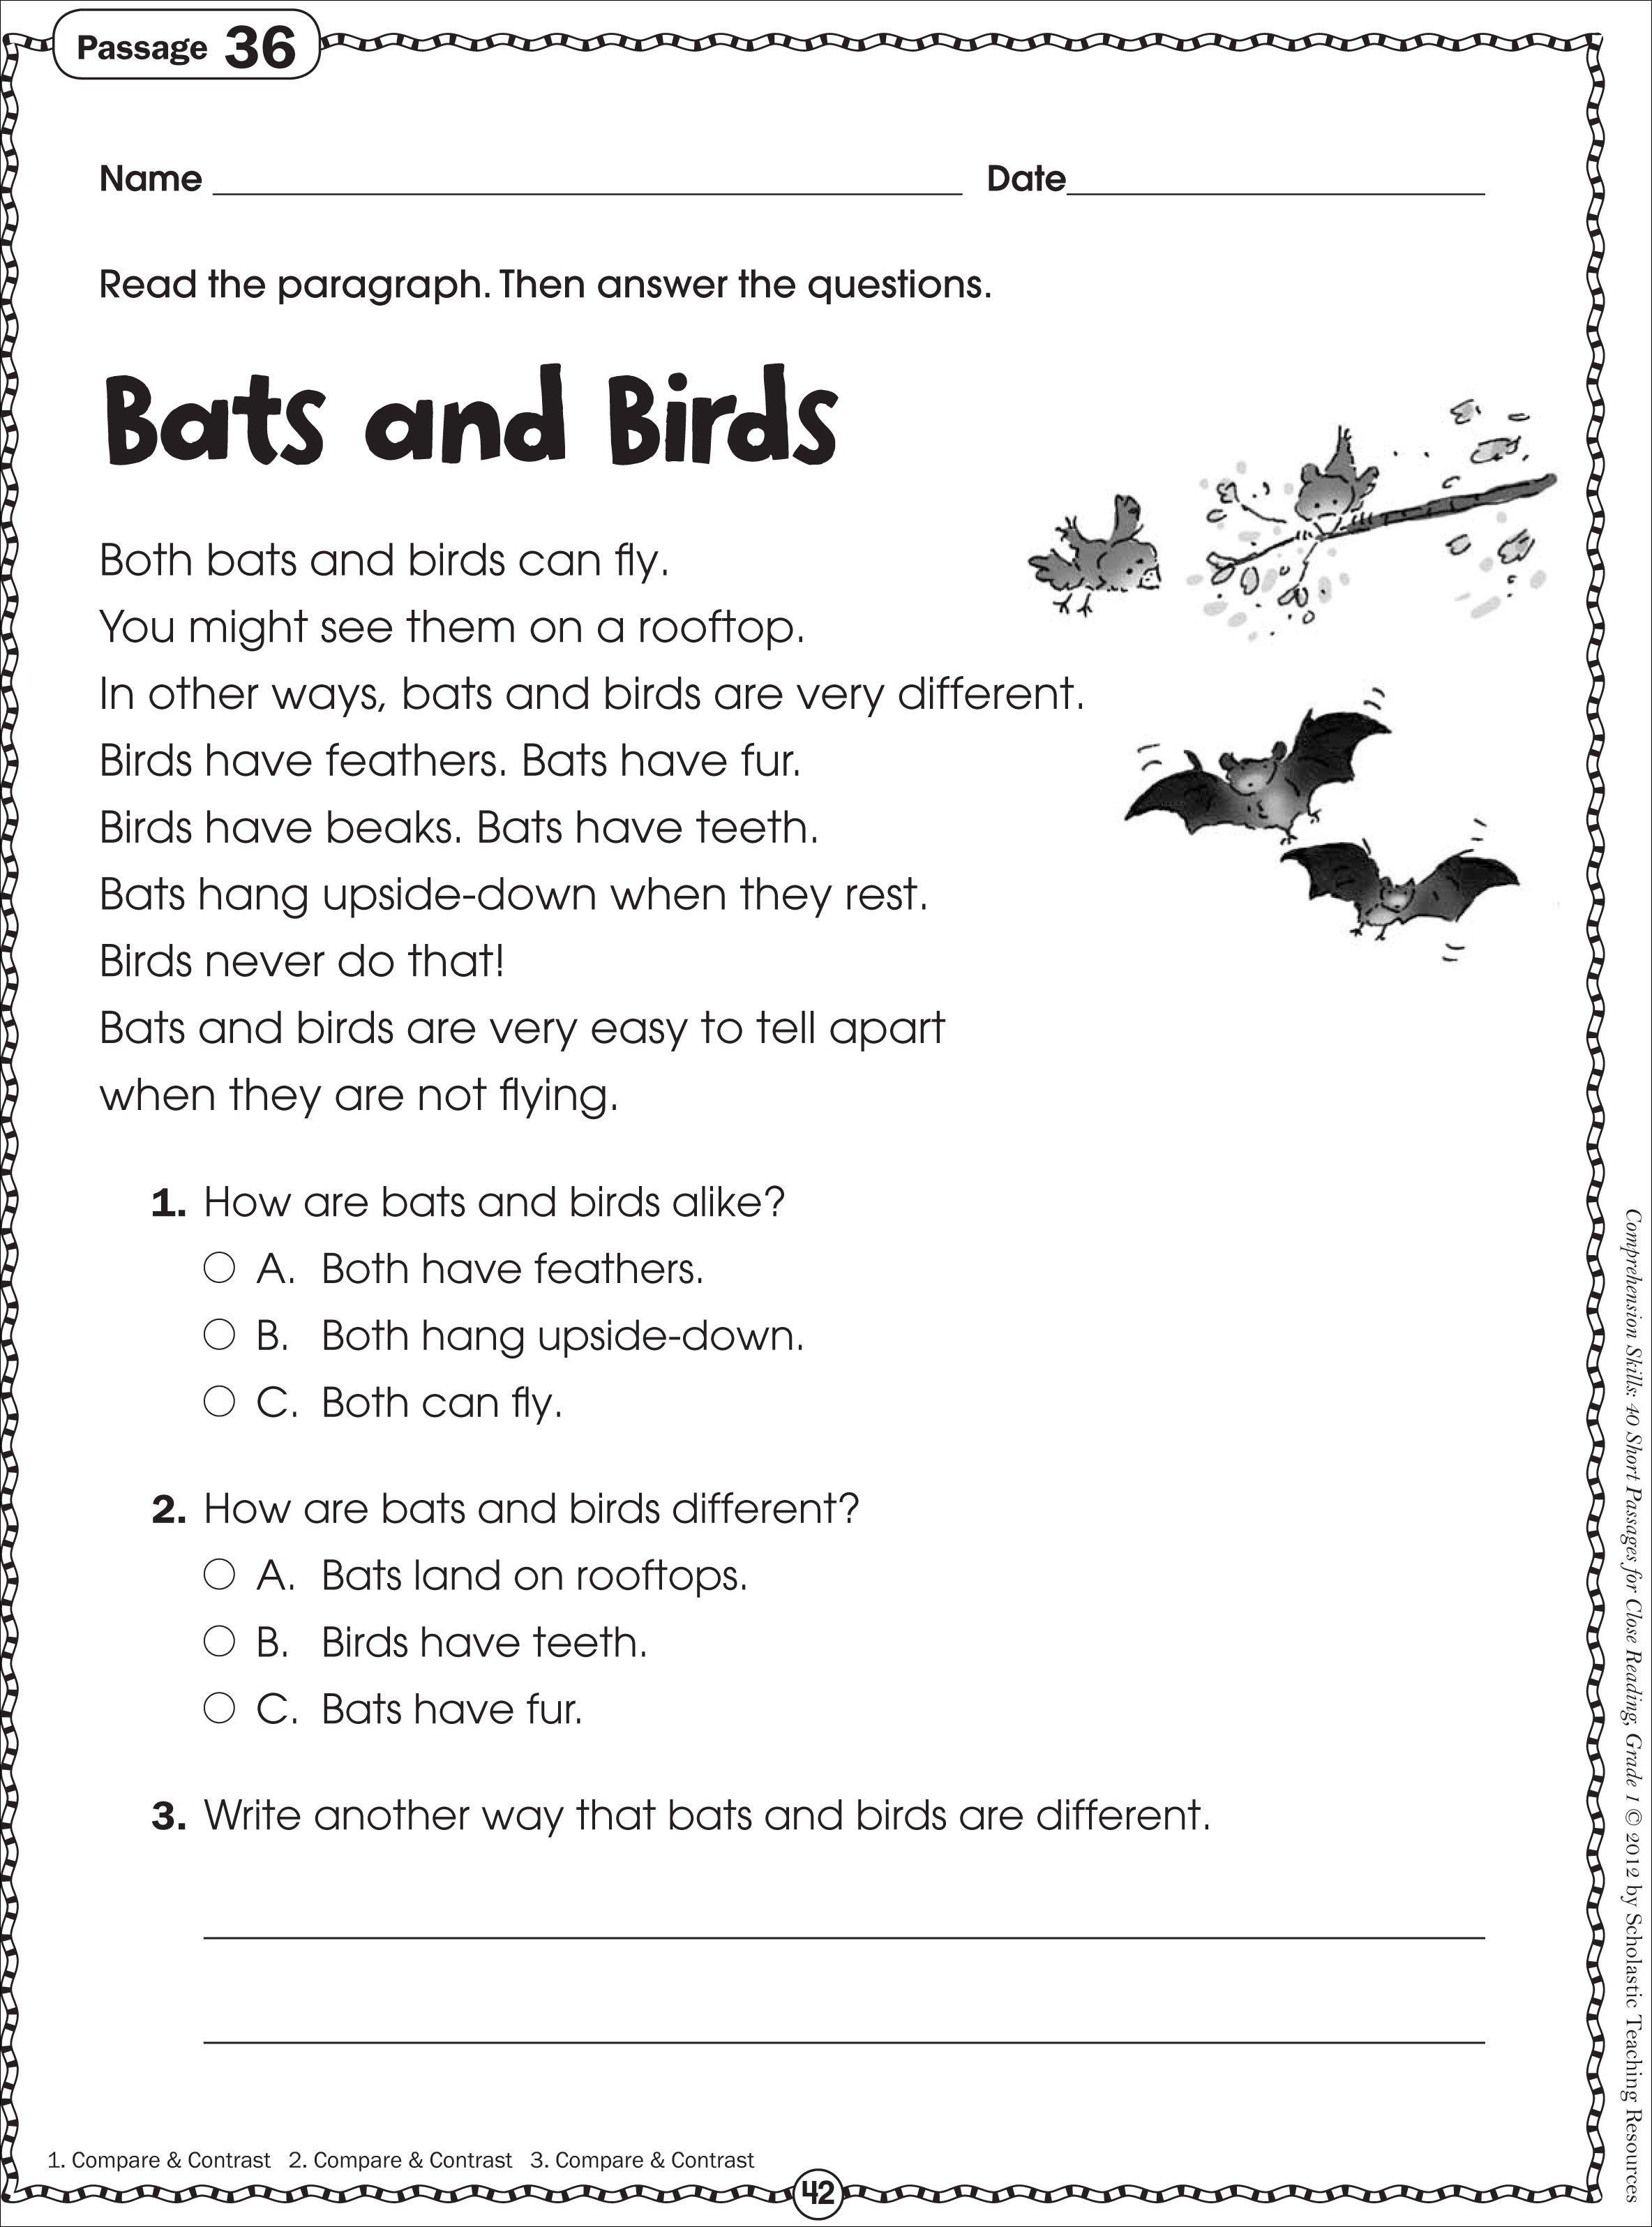 Free Printable Easy Readers For Kindergarten